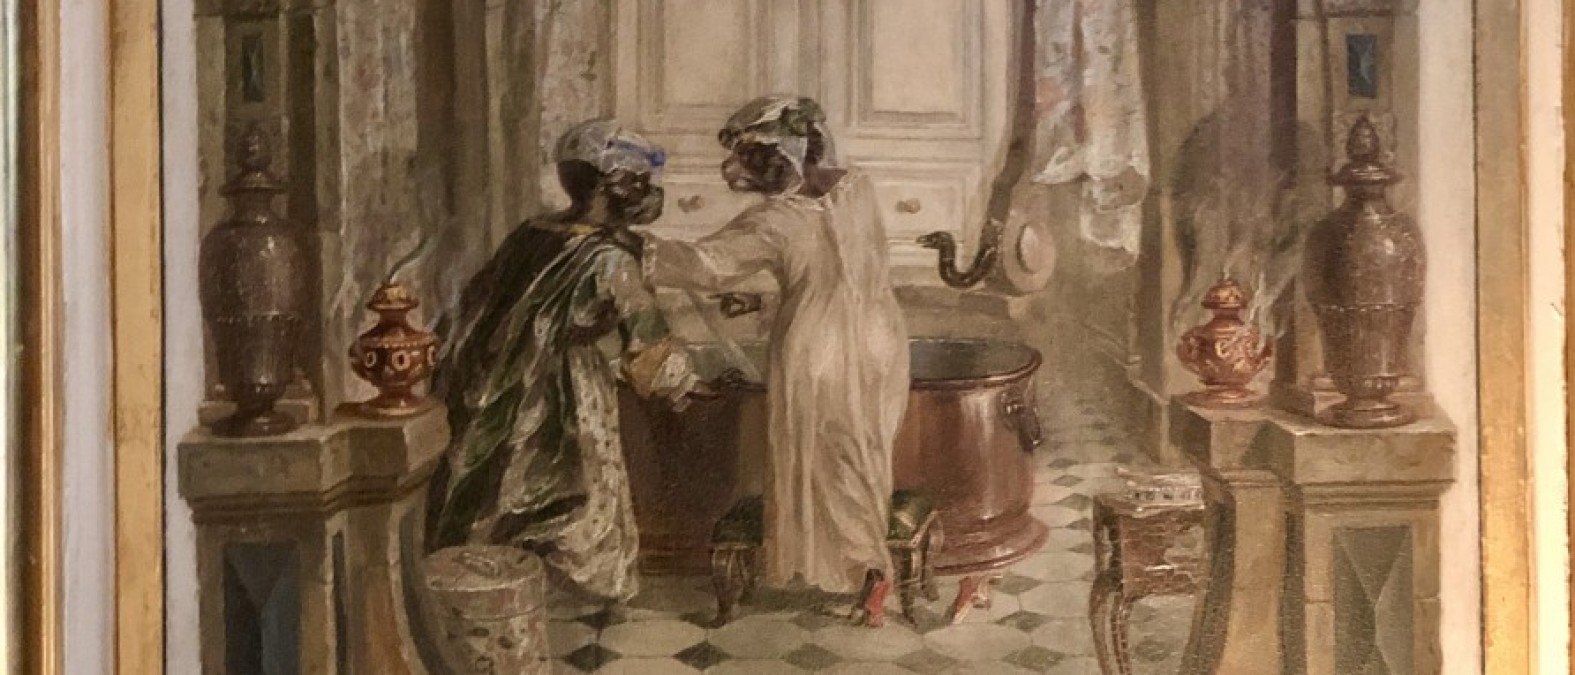 Dettaglio del boudoir-singerie